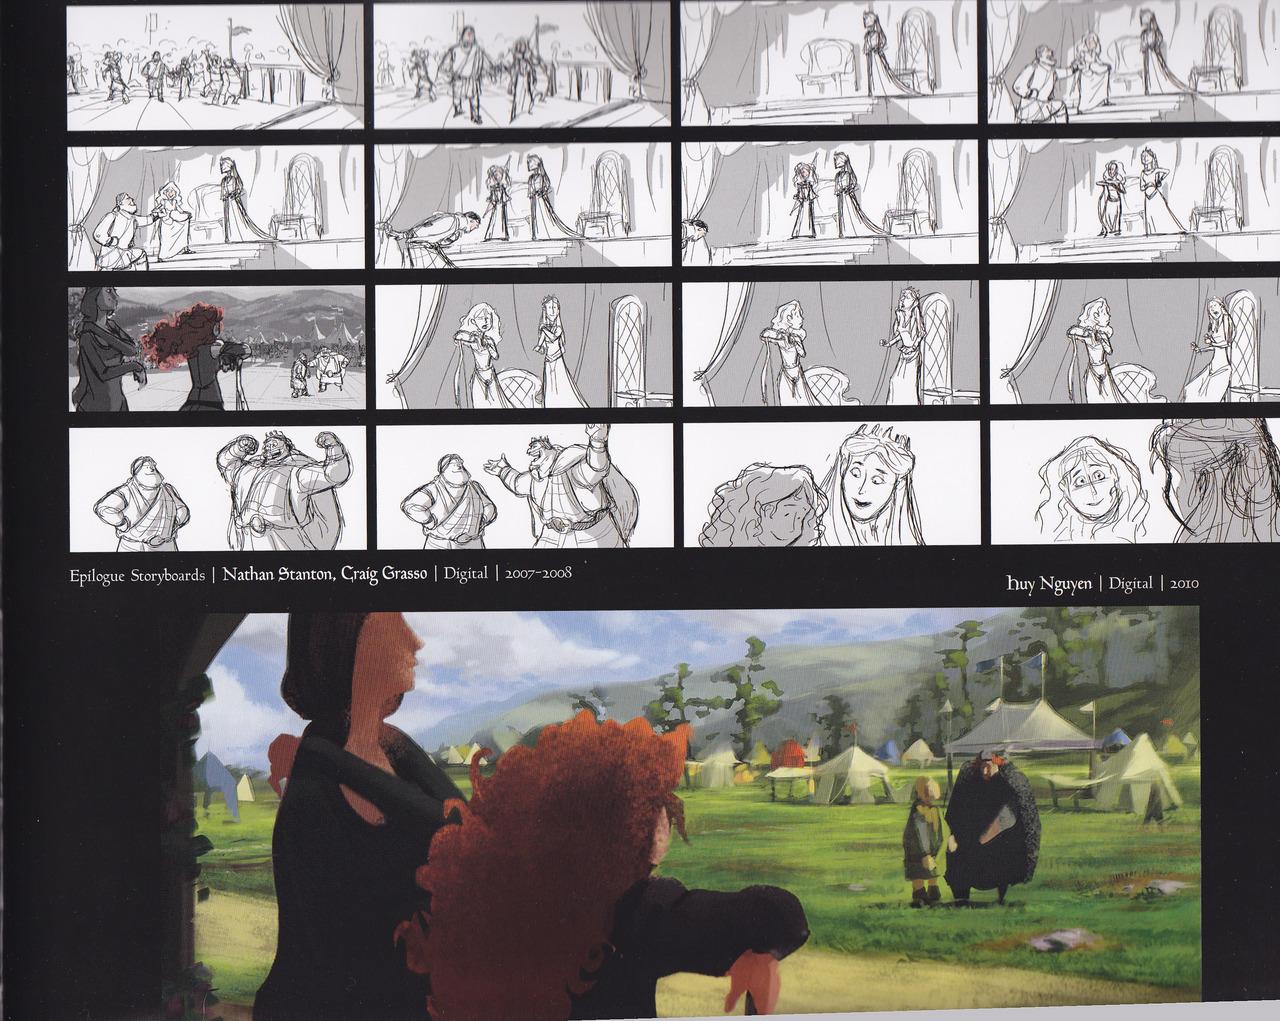 Rebelle [Pixar - 2012] - Page 2 Tumblr_m7yl73sqgY1rtw4qjo1_1280